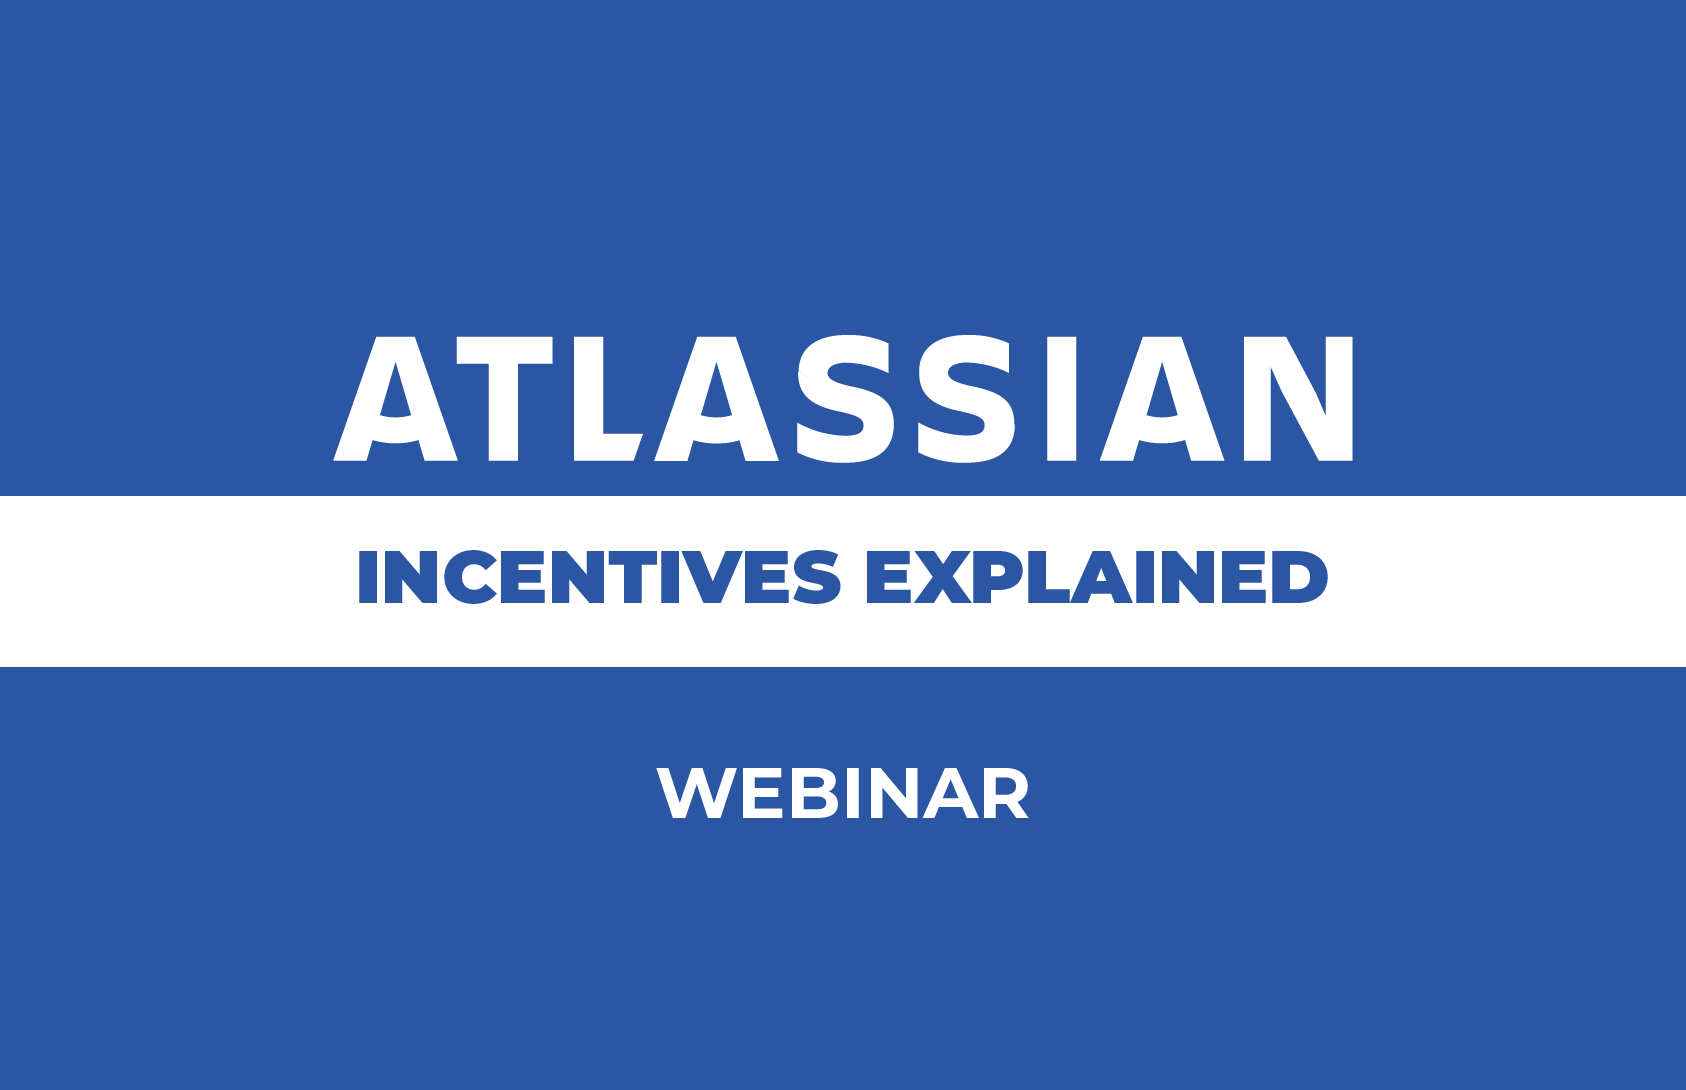 Atlassian Incentives Webinar